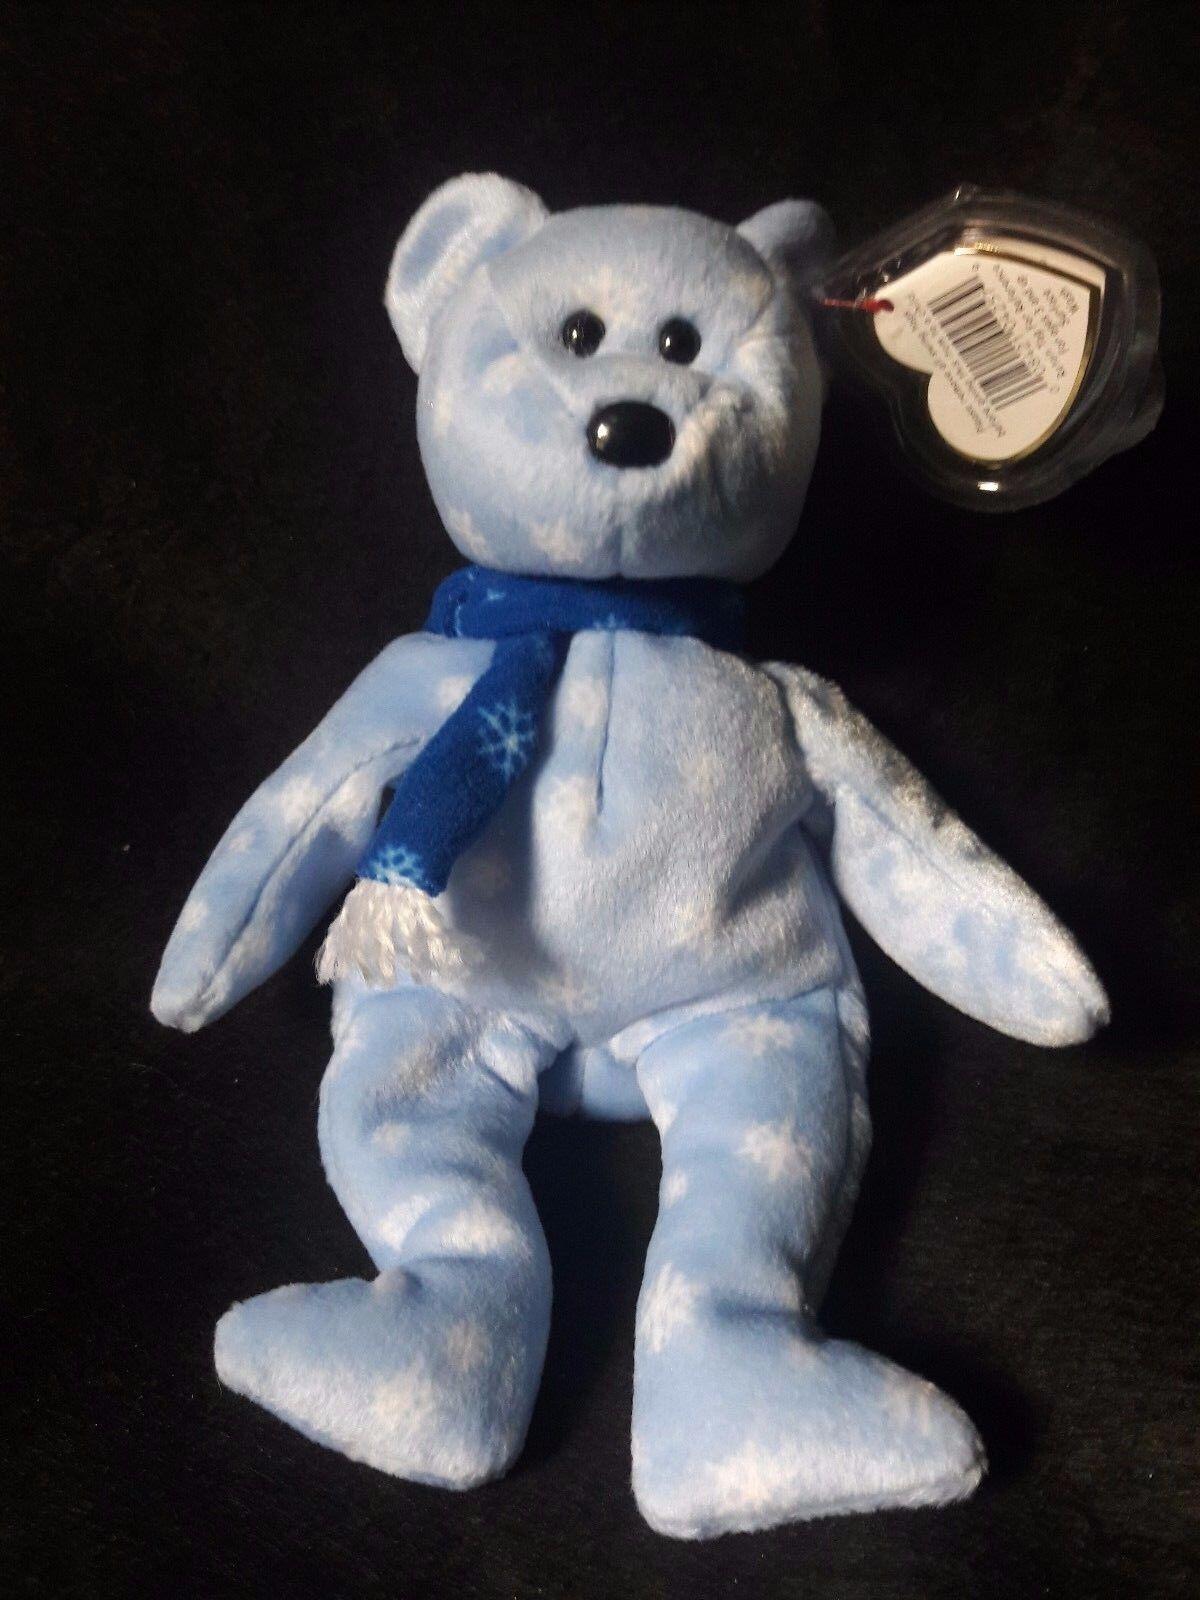 1999 Holiday Teddy beanie baby - Retired- RARE